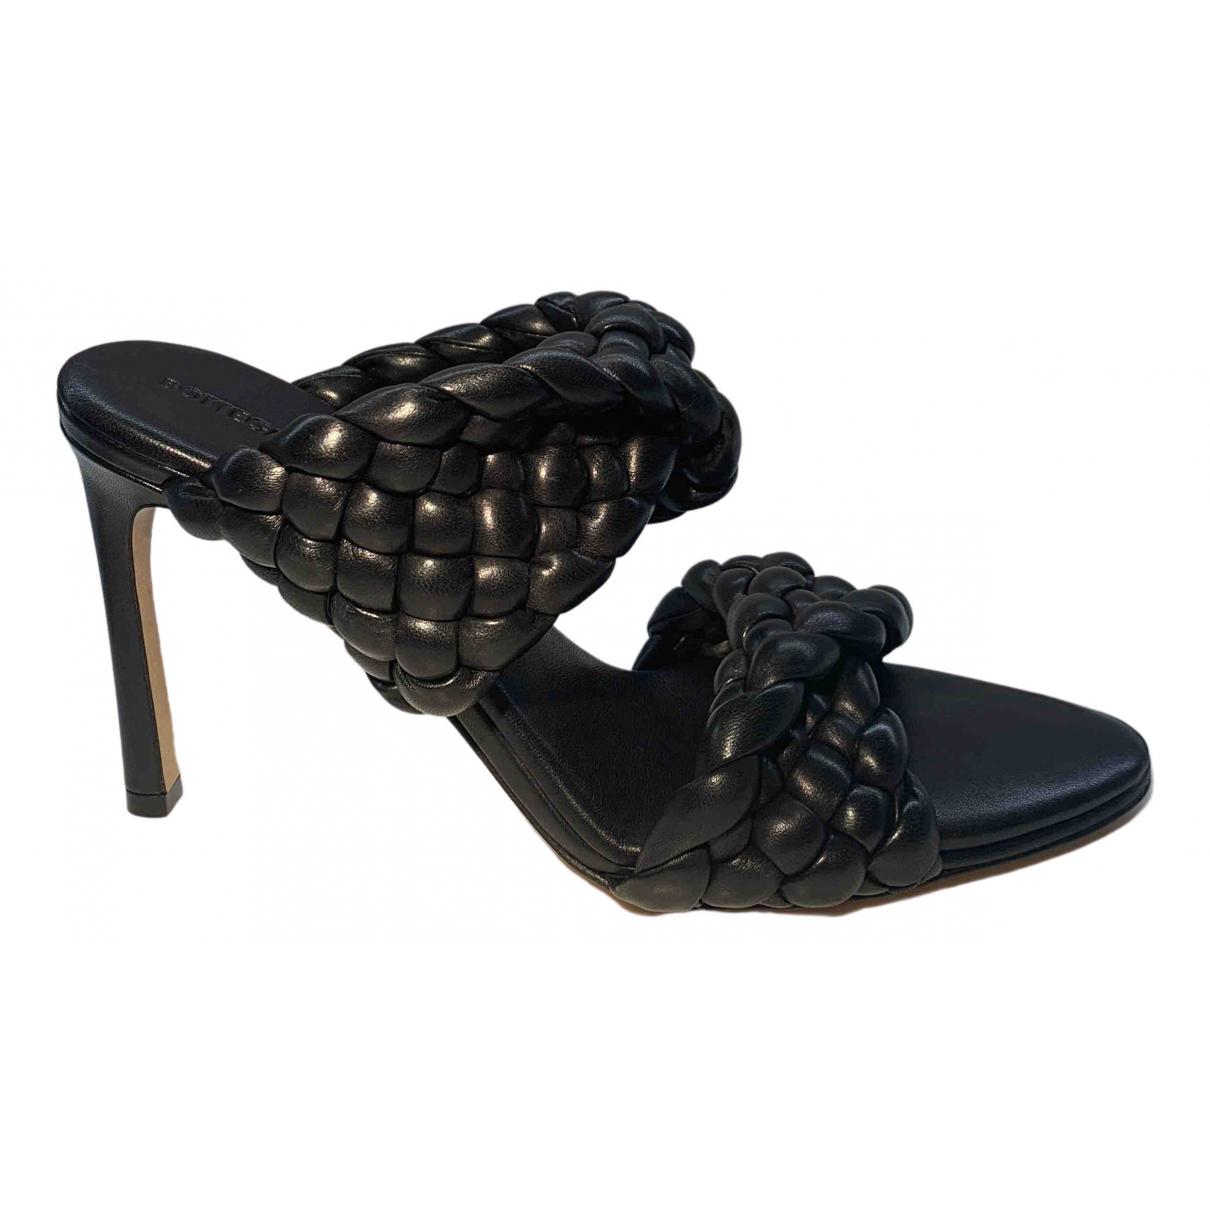 Bottega Veneta BV Curve Black Leather Sandals for Women 41 EU